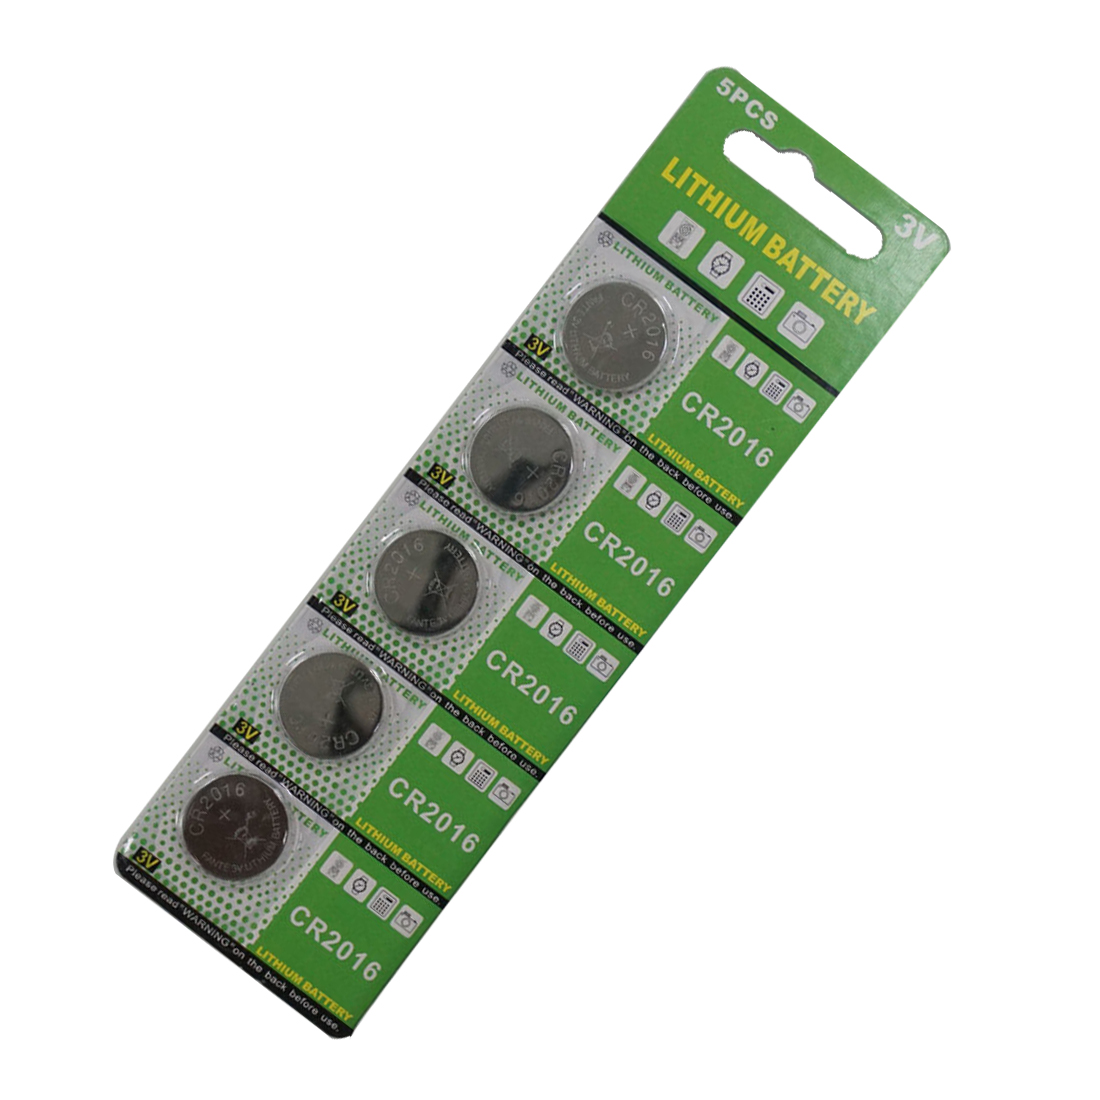 5x Knopfzelle Uhrenbatterie CR2016 LM2016 BR2016 DL2016 KCR2016 ECR2016 3 Volt